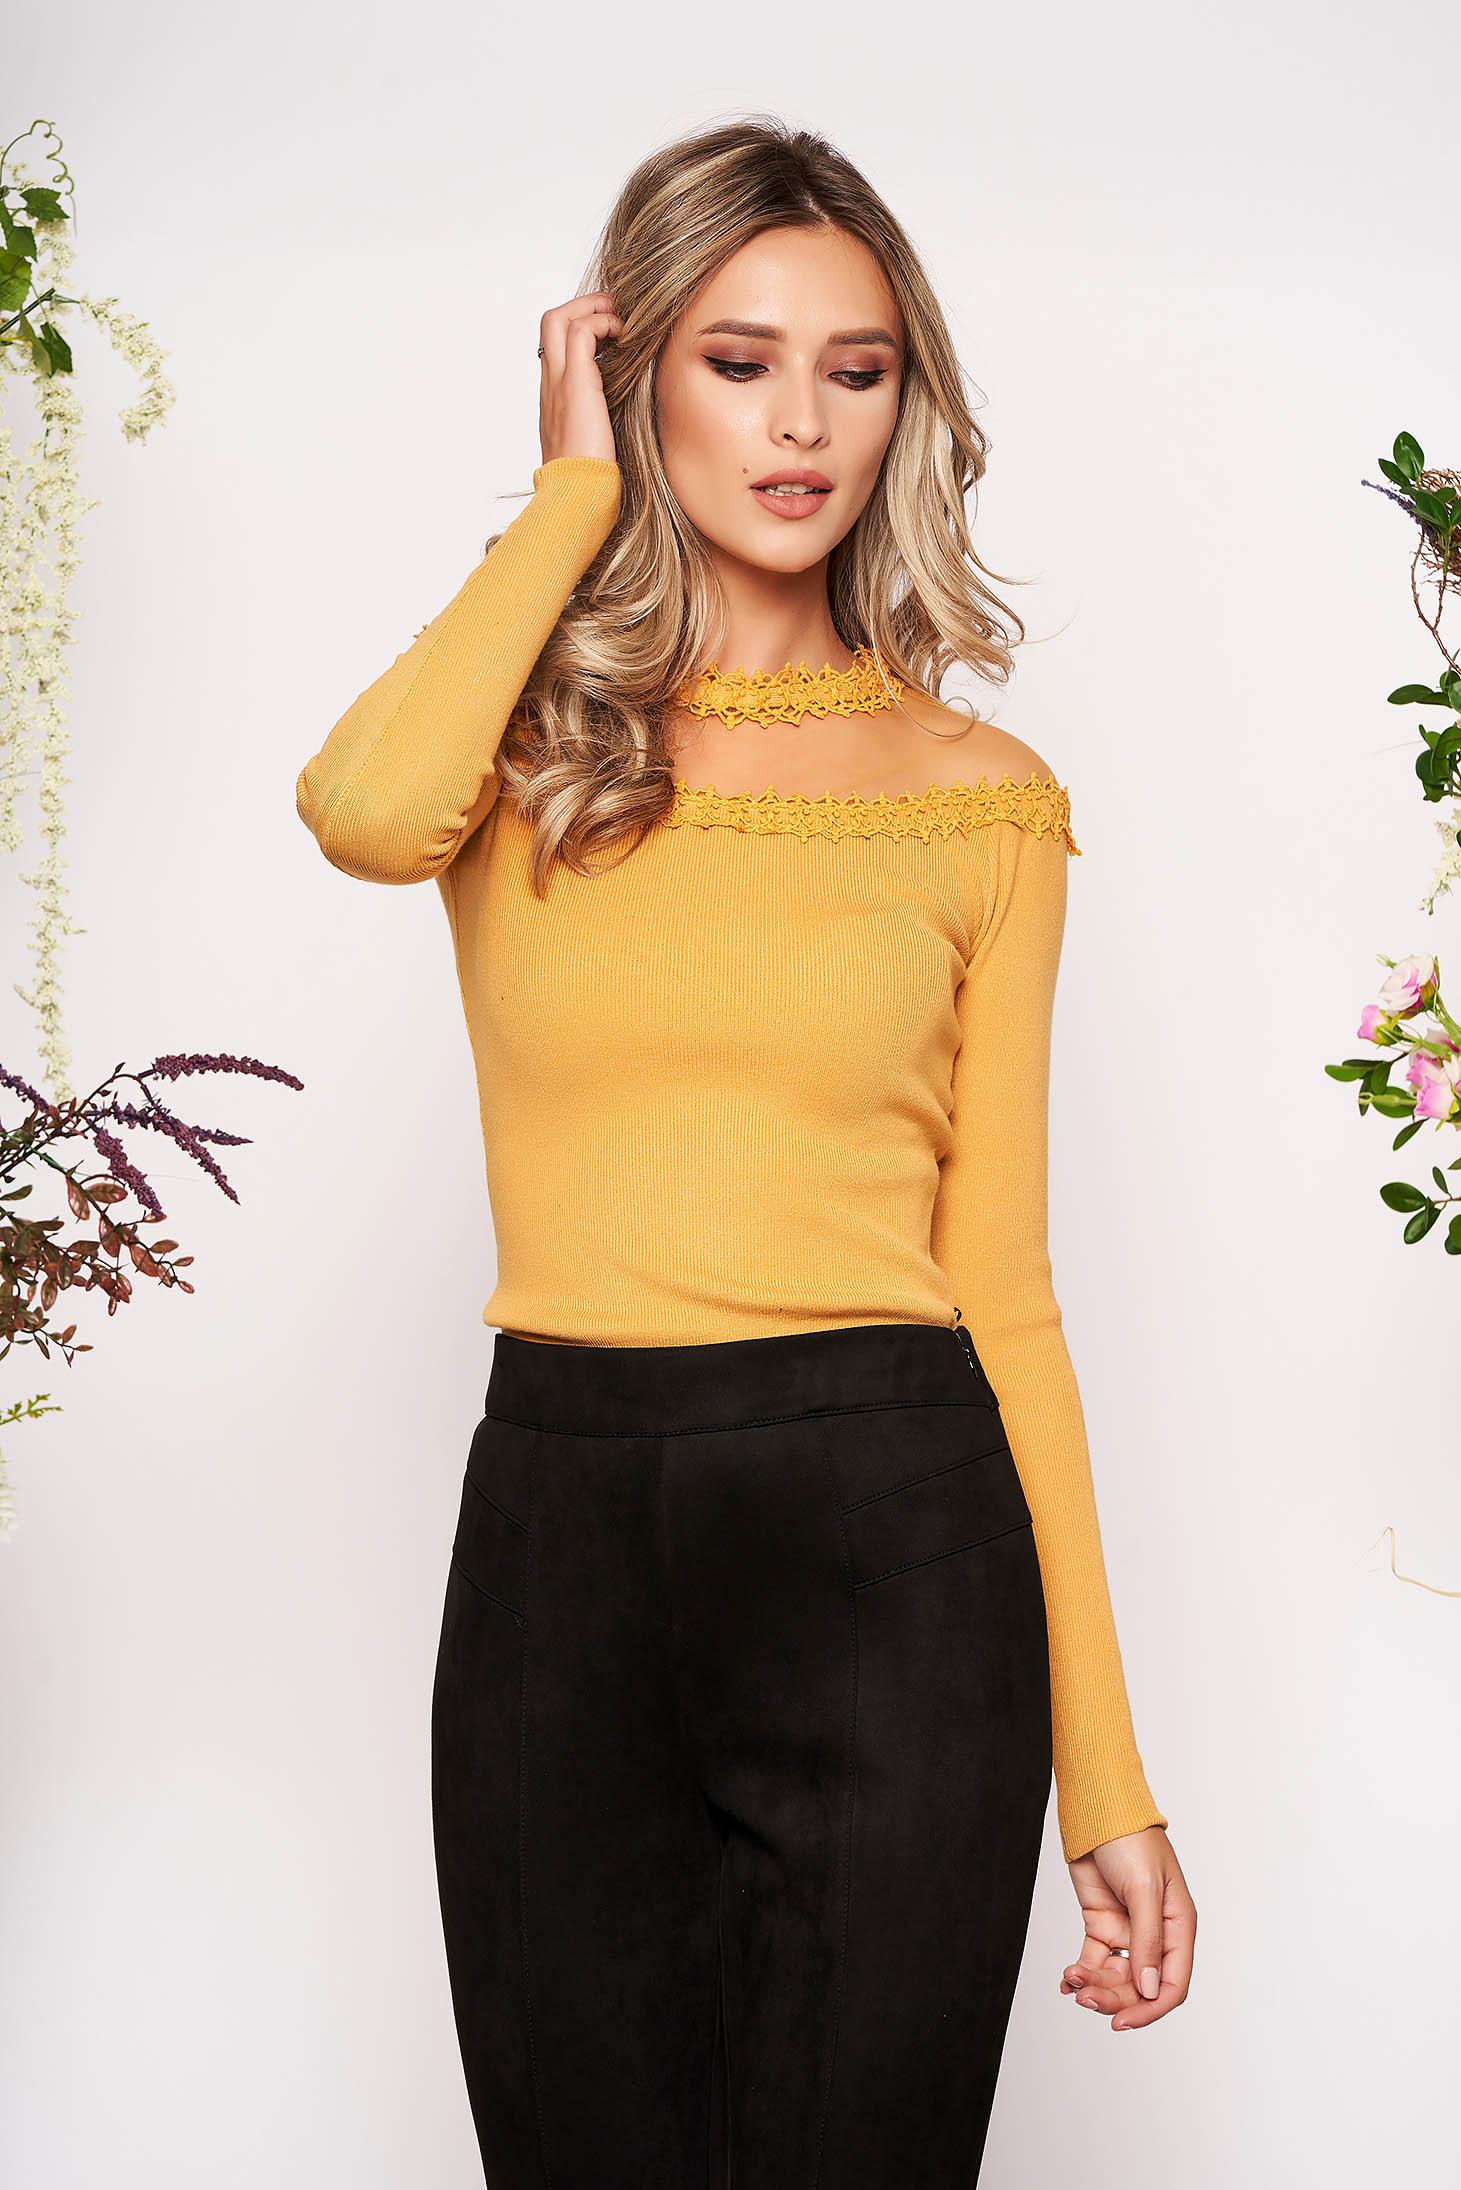 Bluza dama SunShine mustarie din material tricotat din dantela cu un croi mulat cu maneca lunga